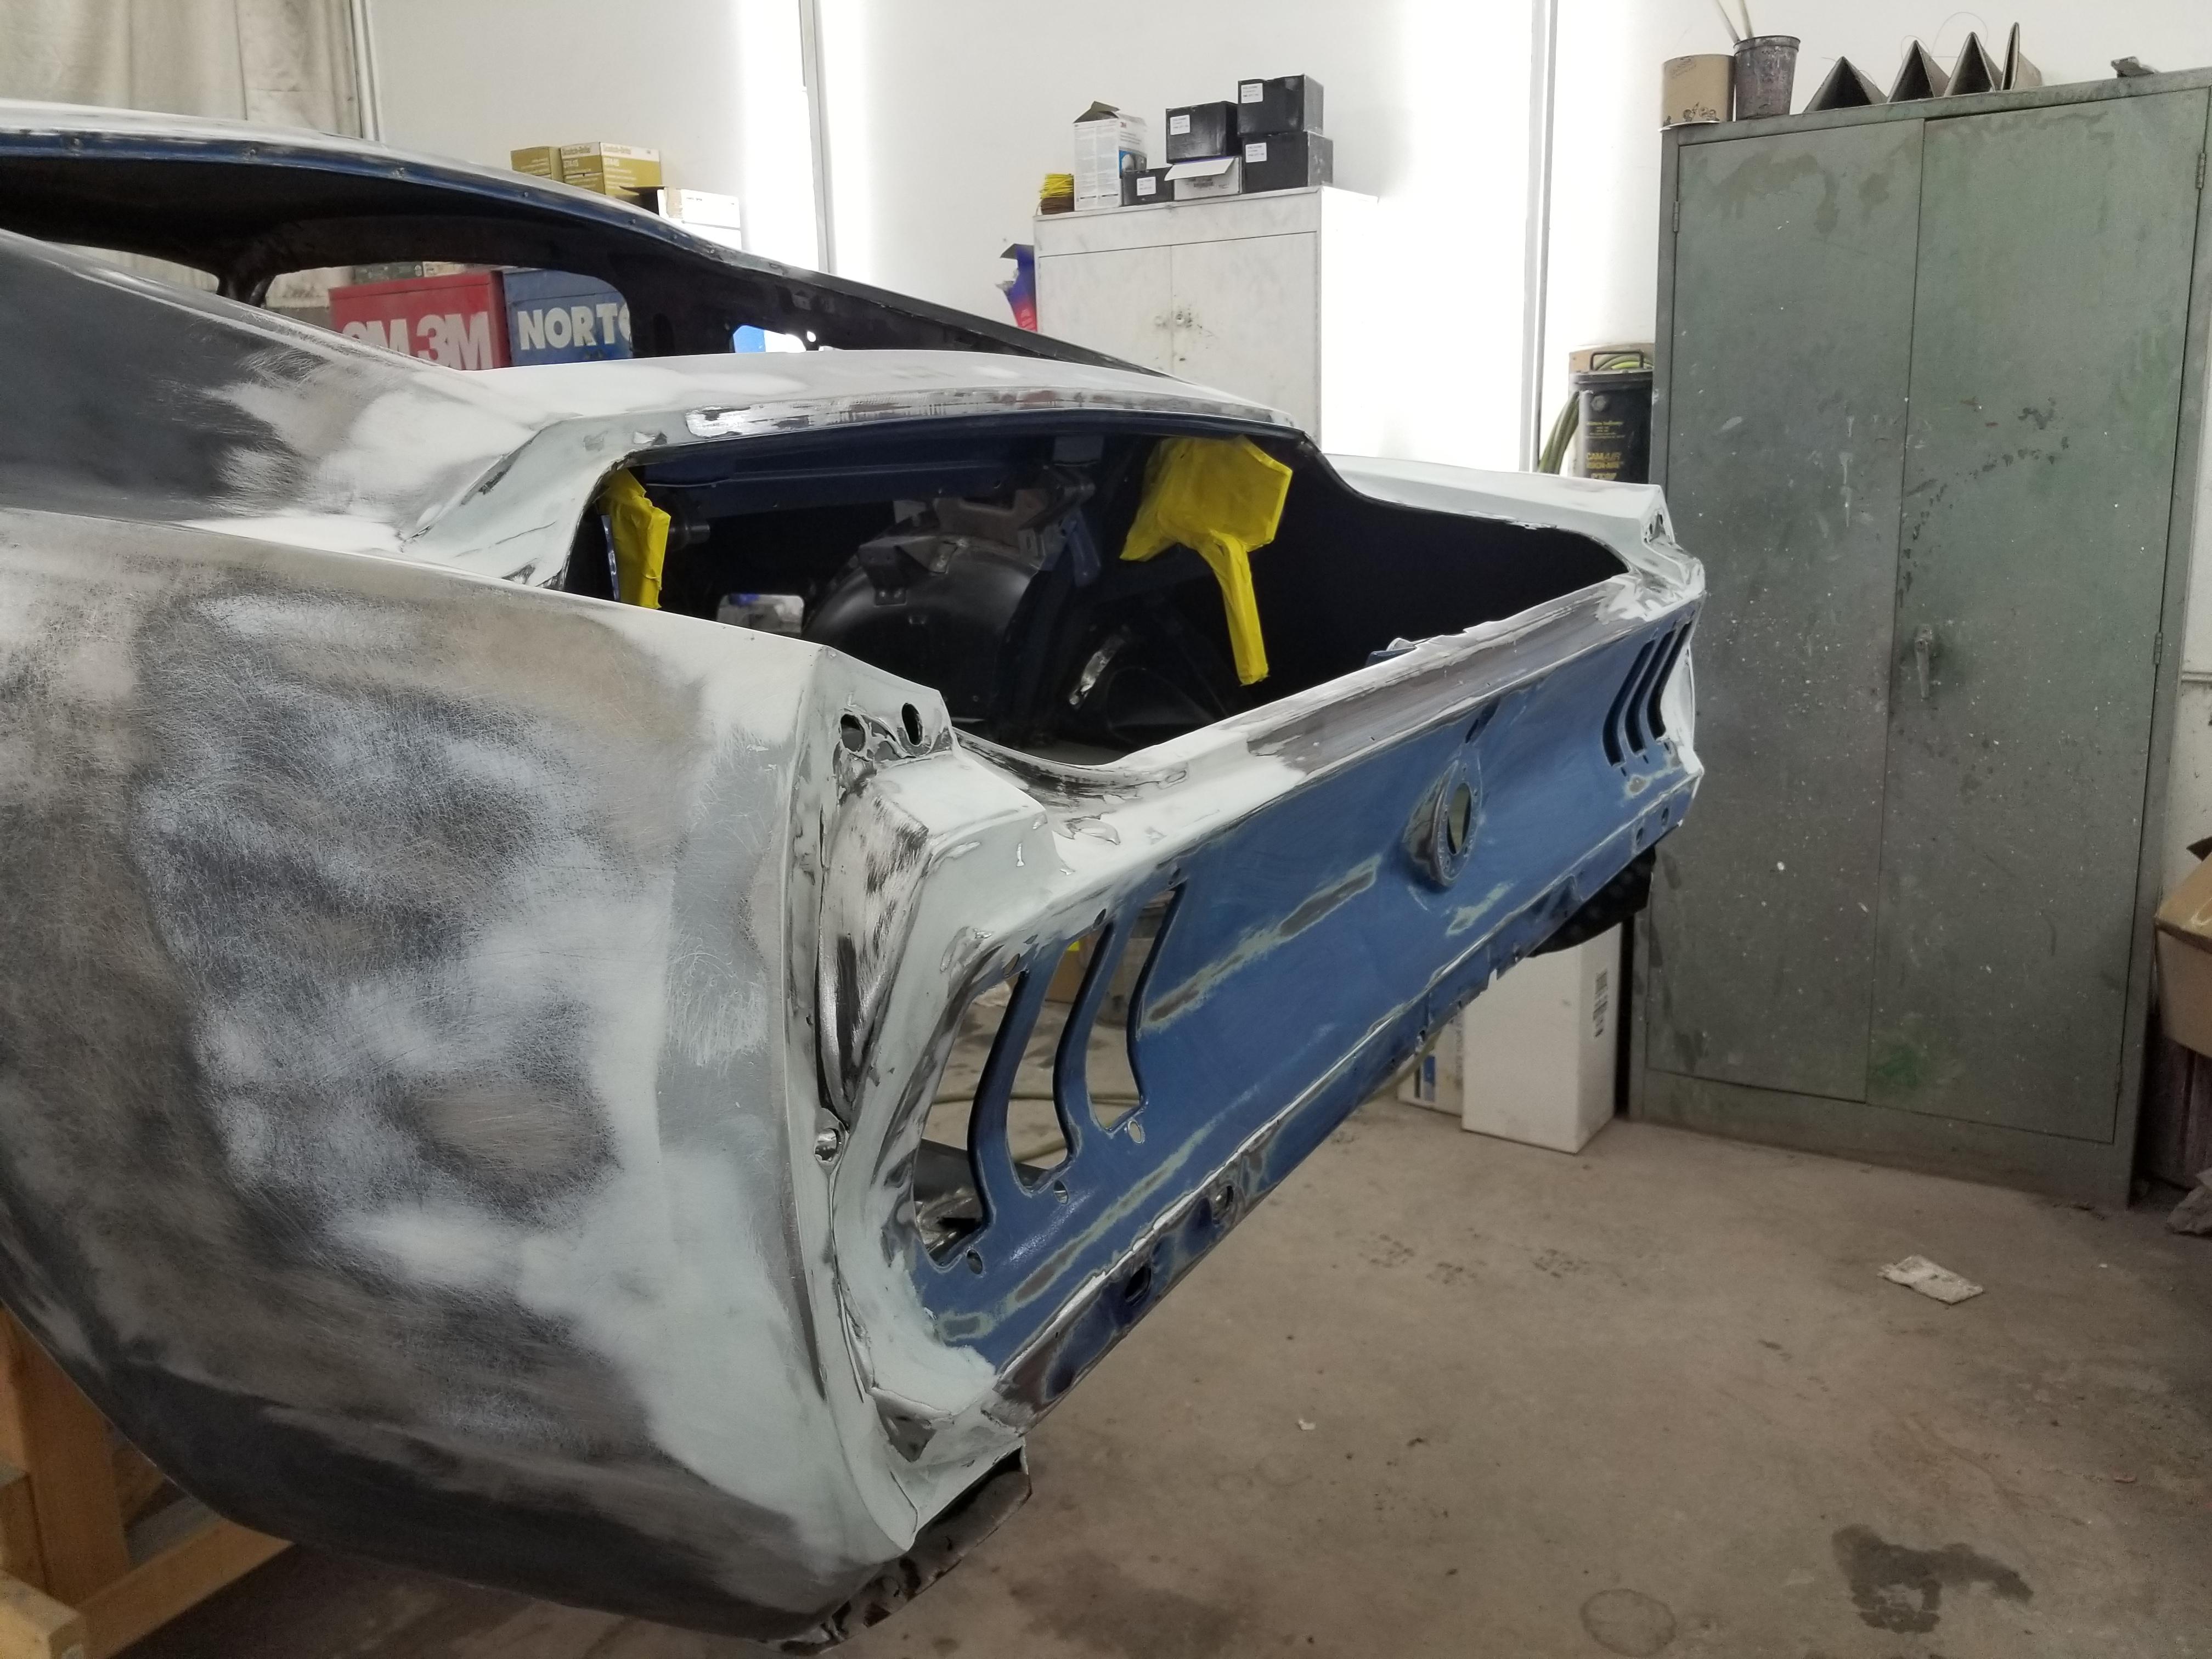 67 Mustang Custom body work